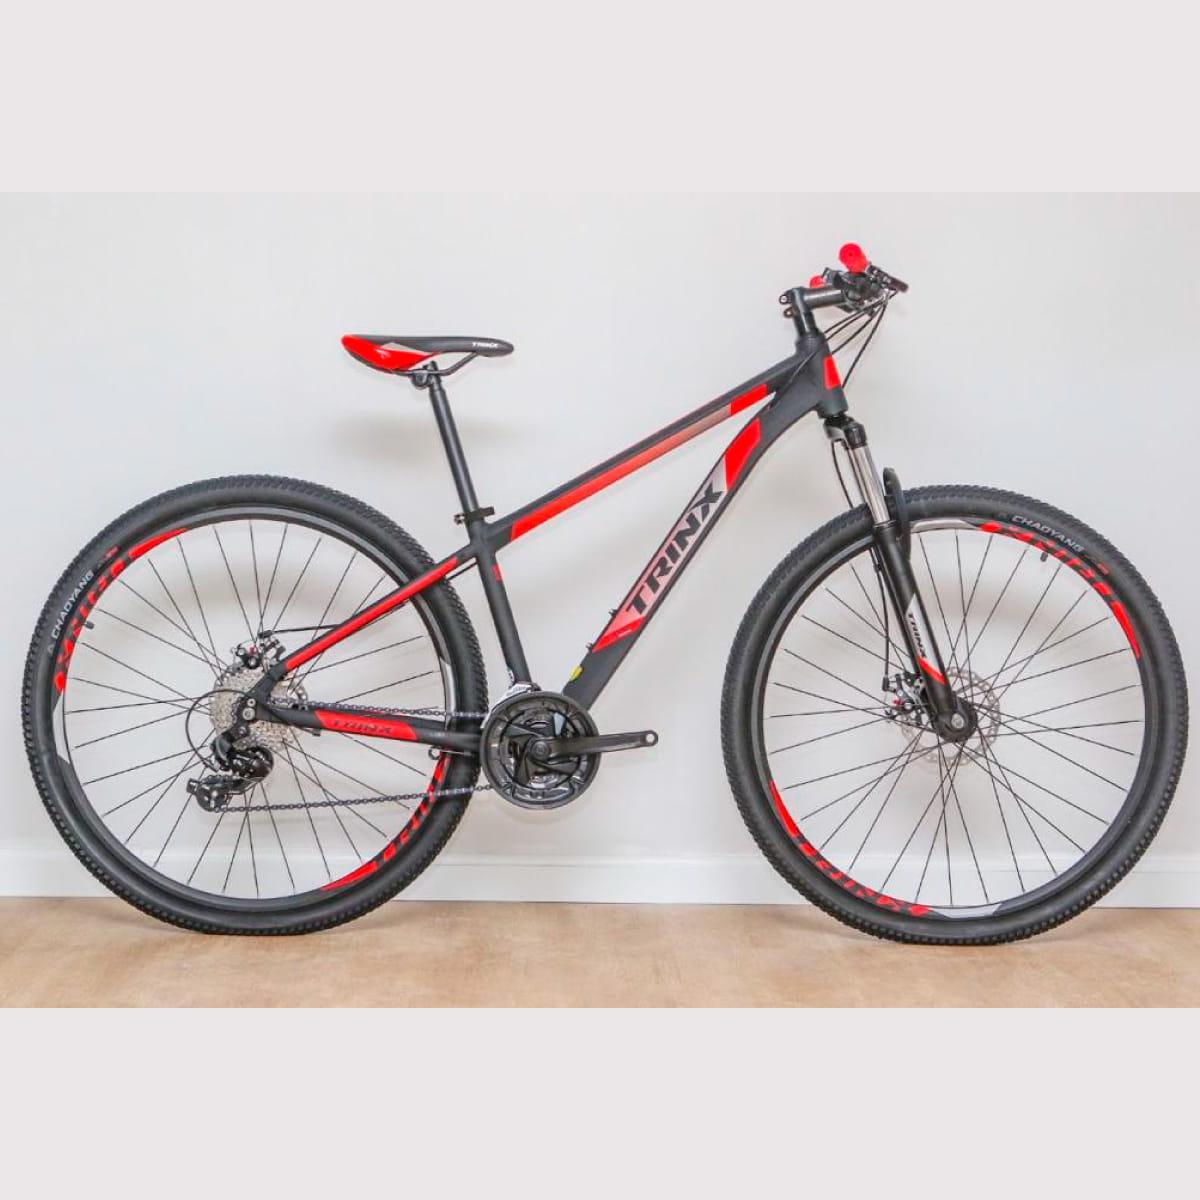 Bike Trinx M100 Max 2020 24v Shimano Vermelho